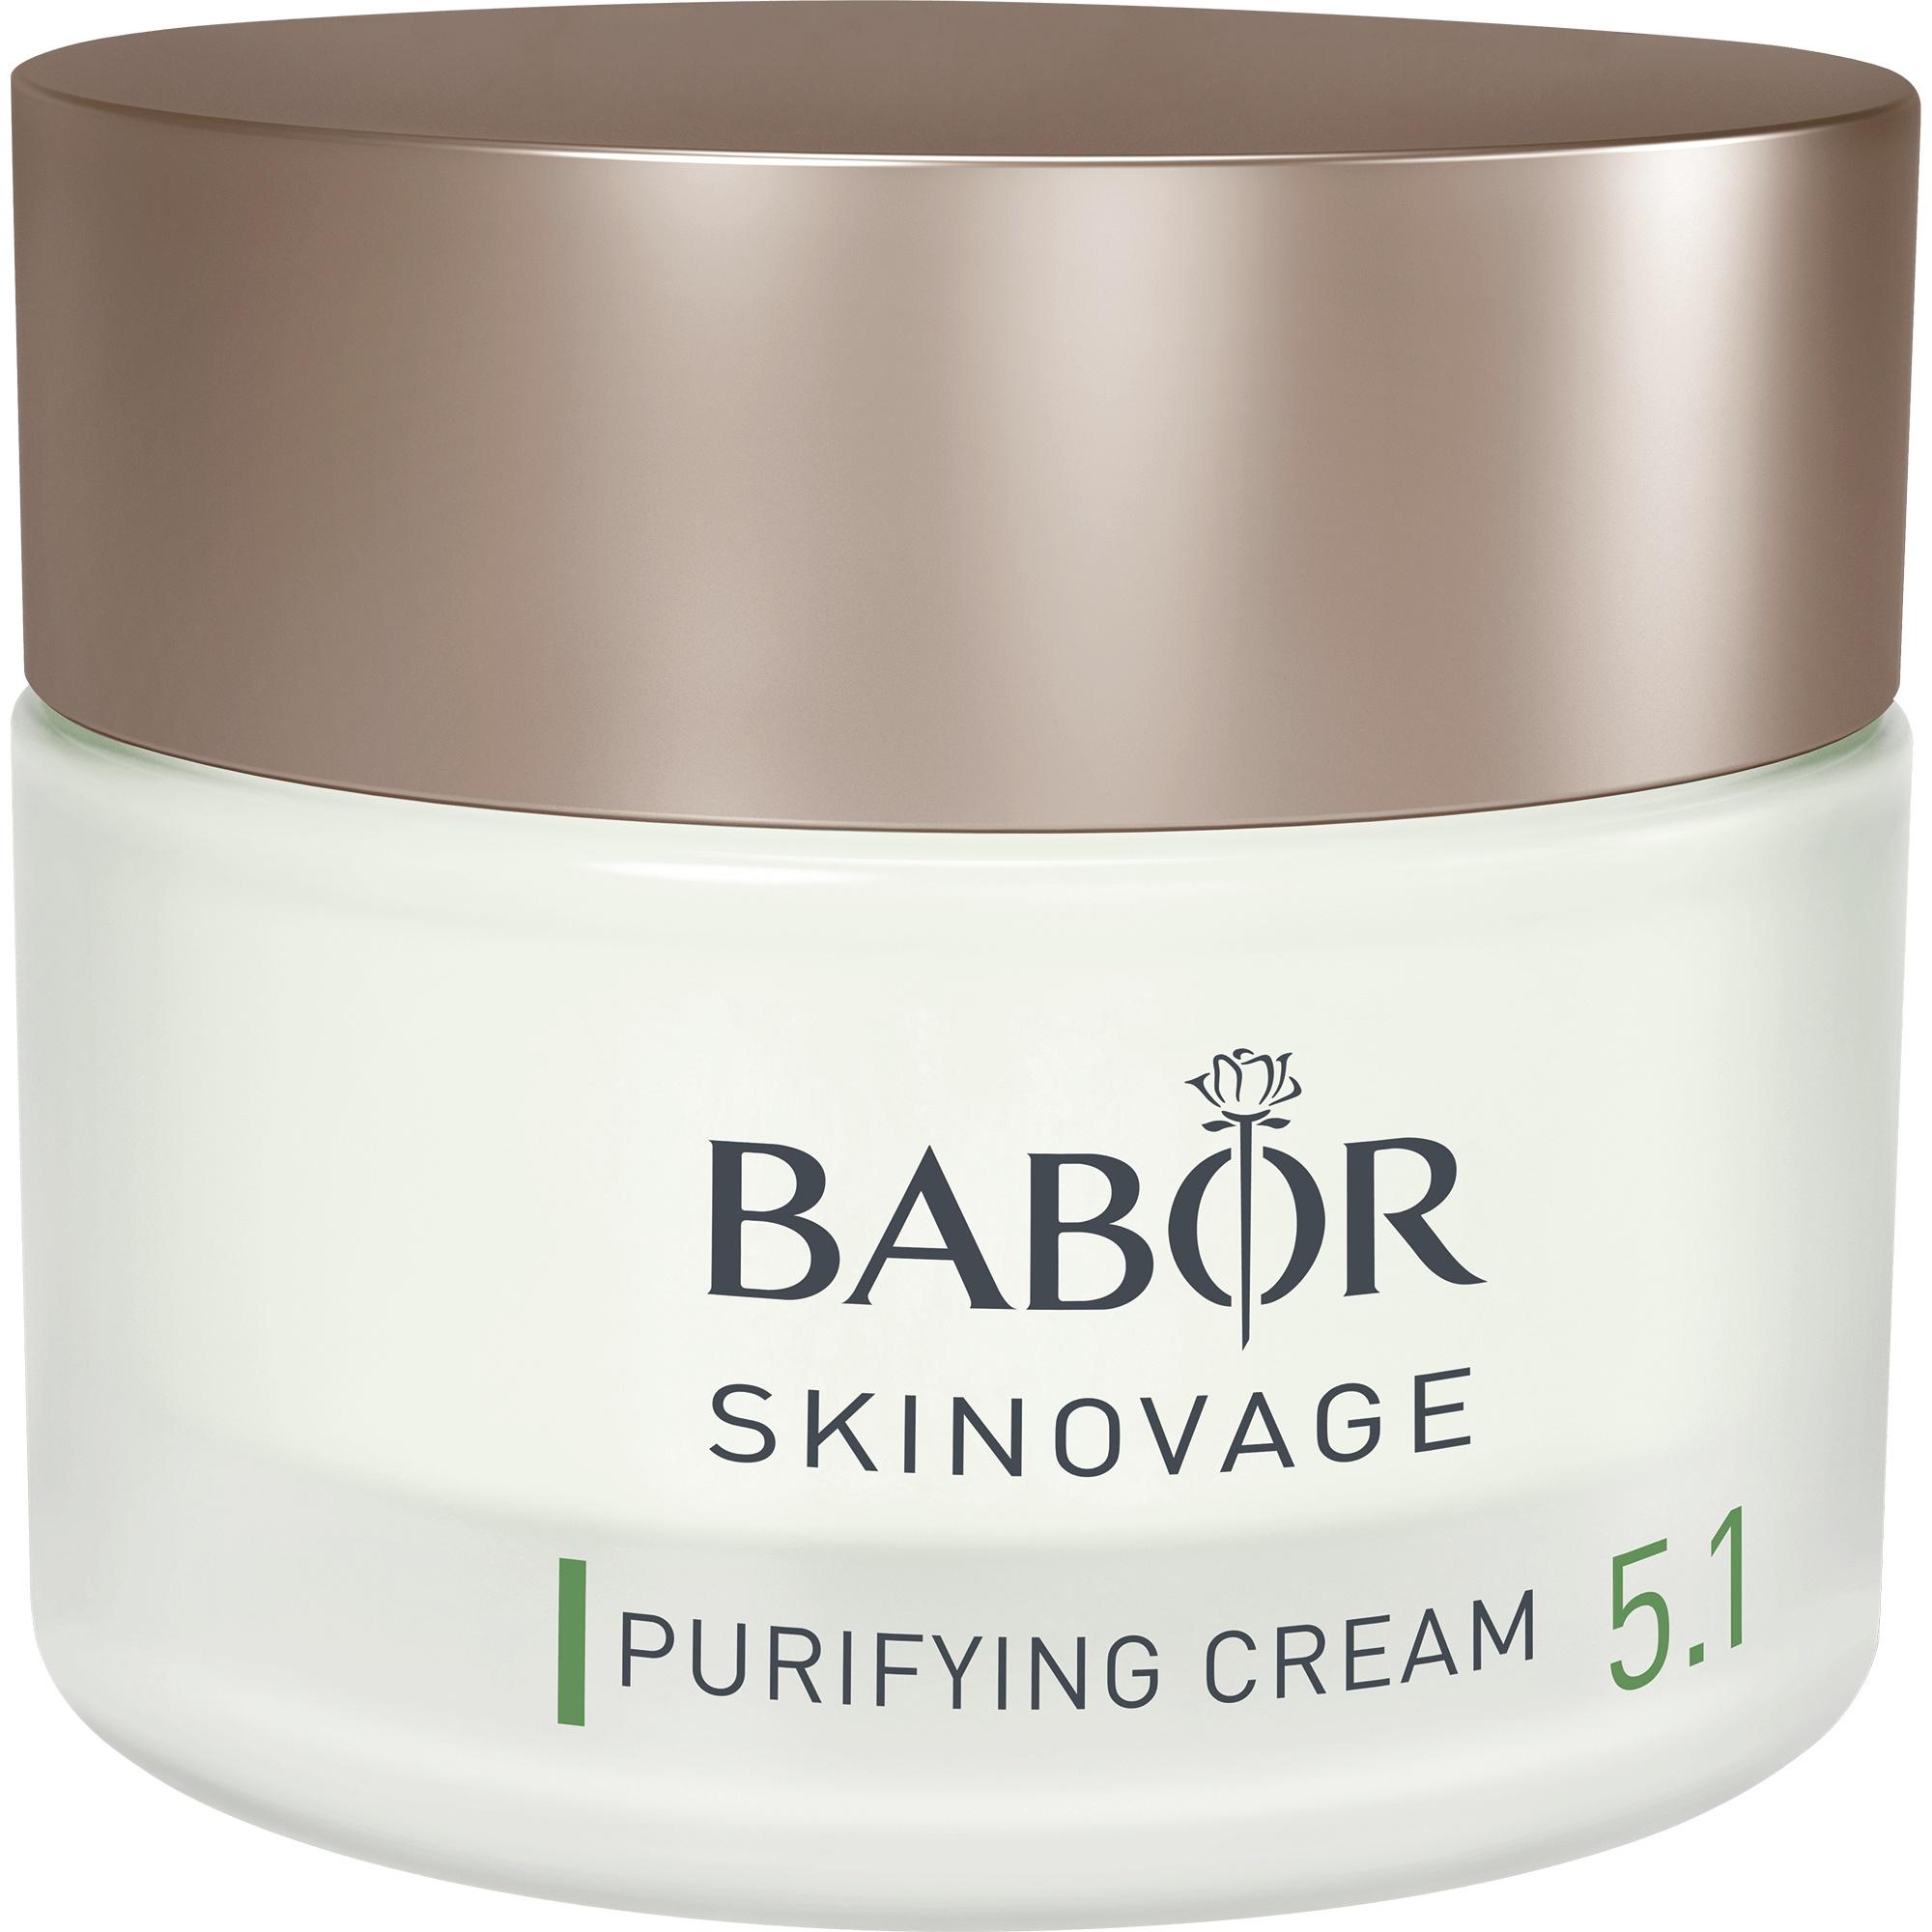 Skinovage Purfiying Cream 50ml